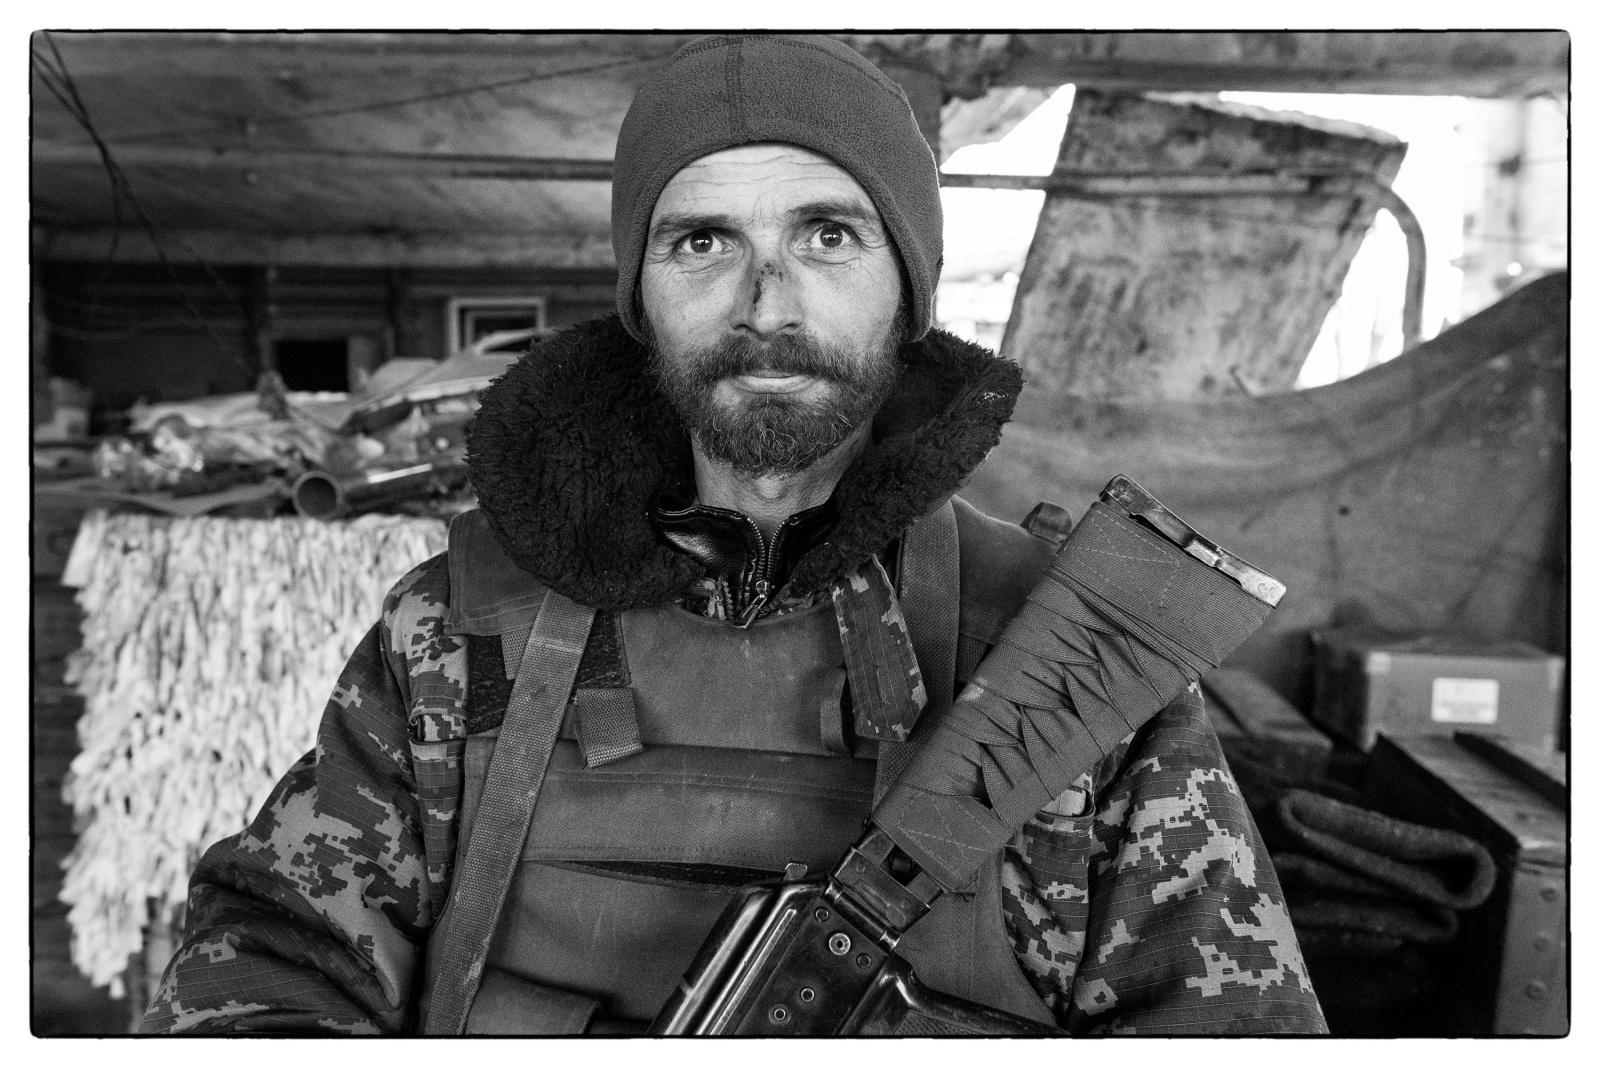 Donbass, Ukraine (2017). The Russian siege of Avdiivka